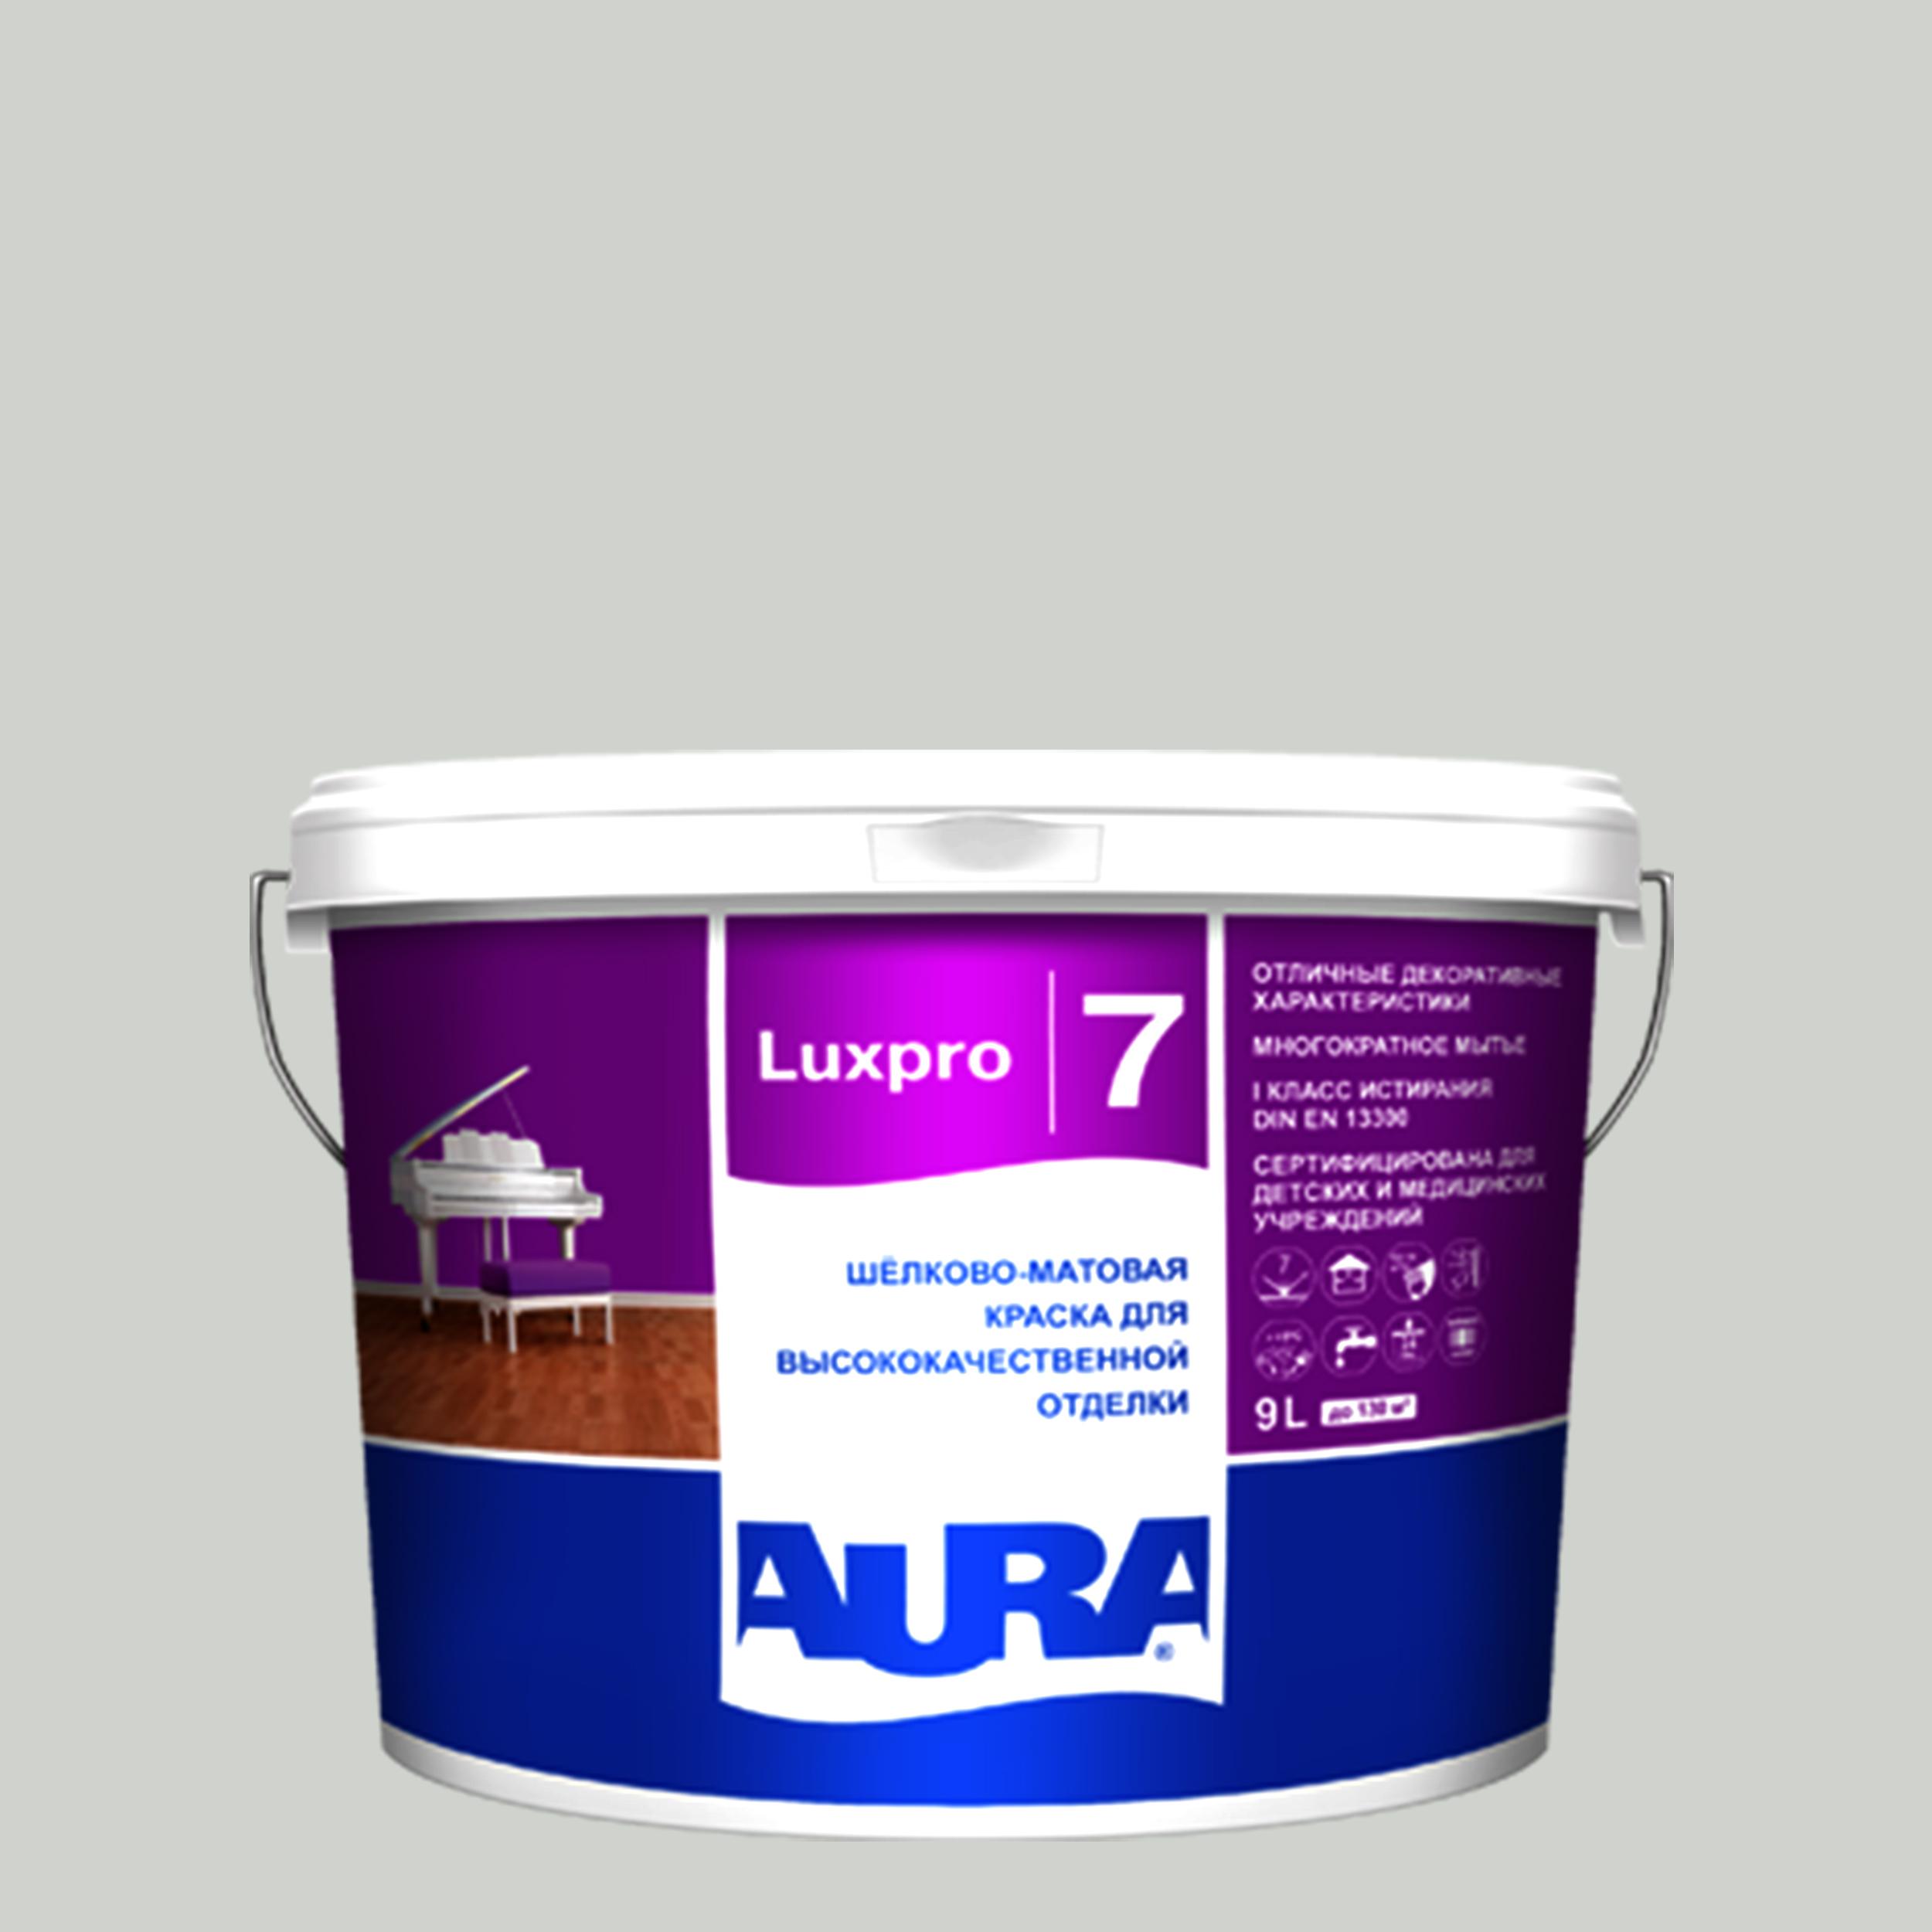 Фото 5 - Краска интерьерная, Aura LuxPRO 7, RAL 1006, 11 кг.